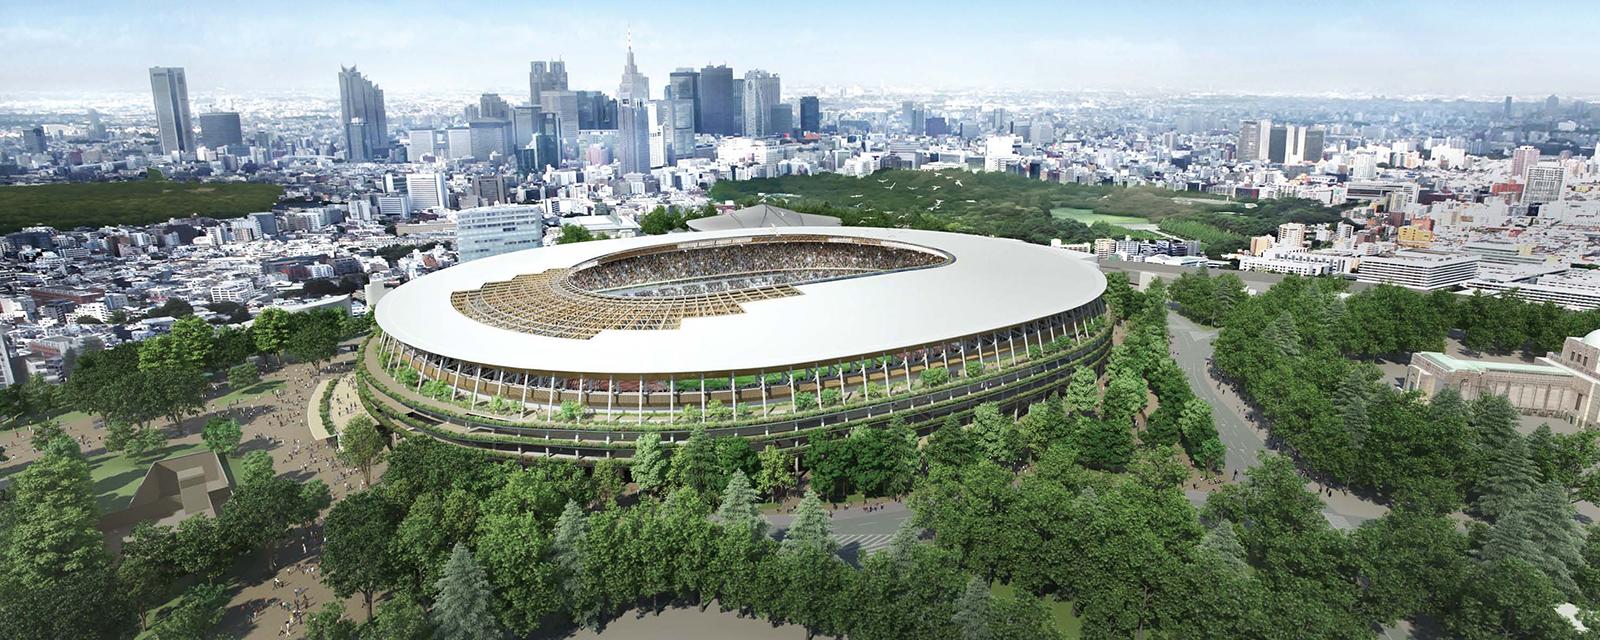 National Stadium of the 2020 Tokyo Olympics, project by Kengo Kuma. Image @ Kengo Kuma